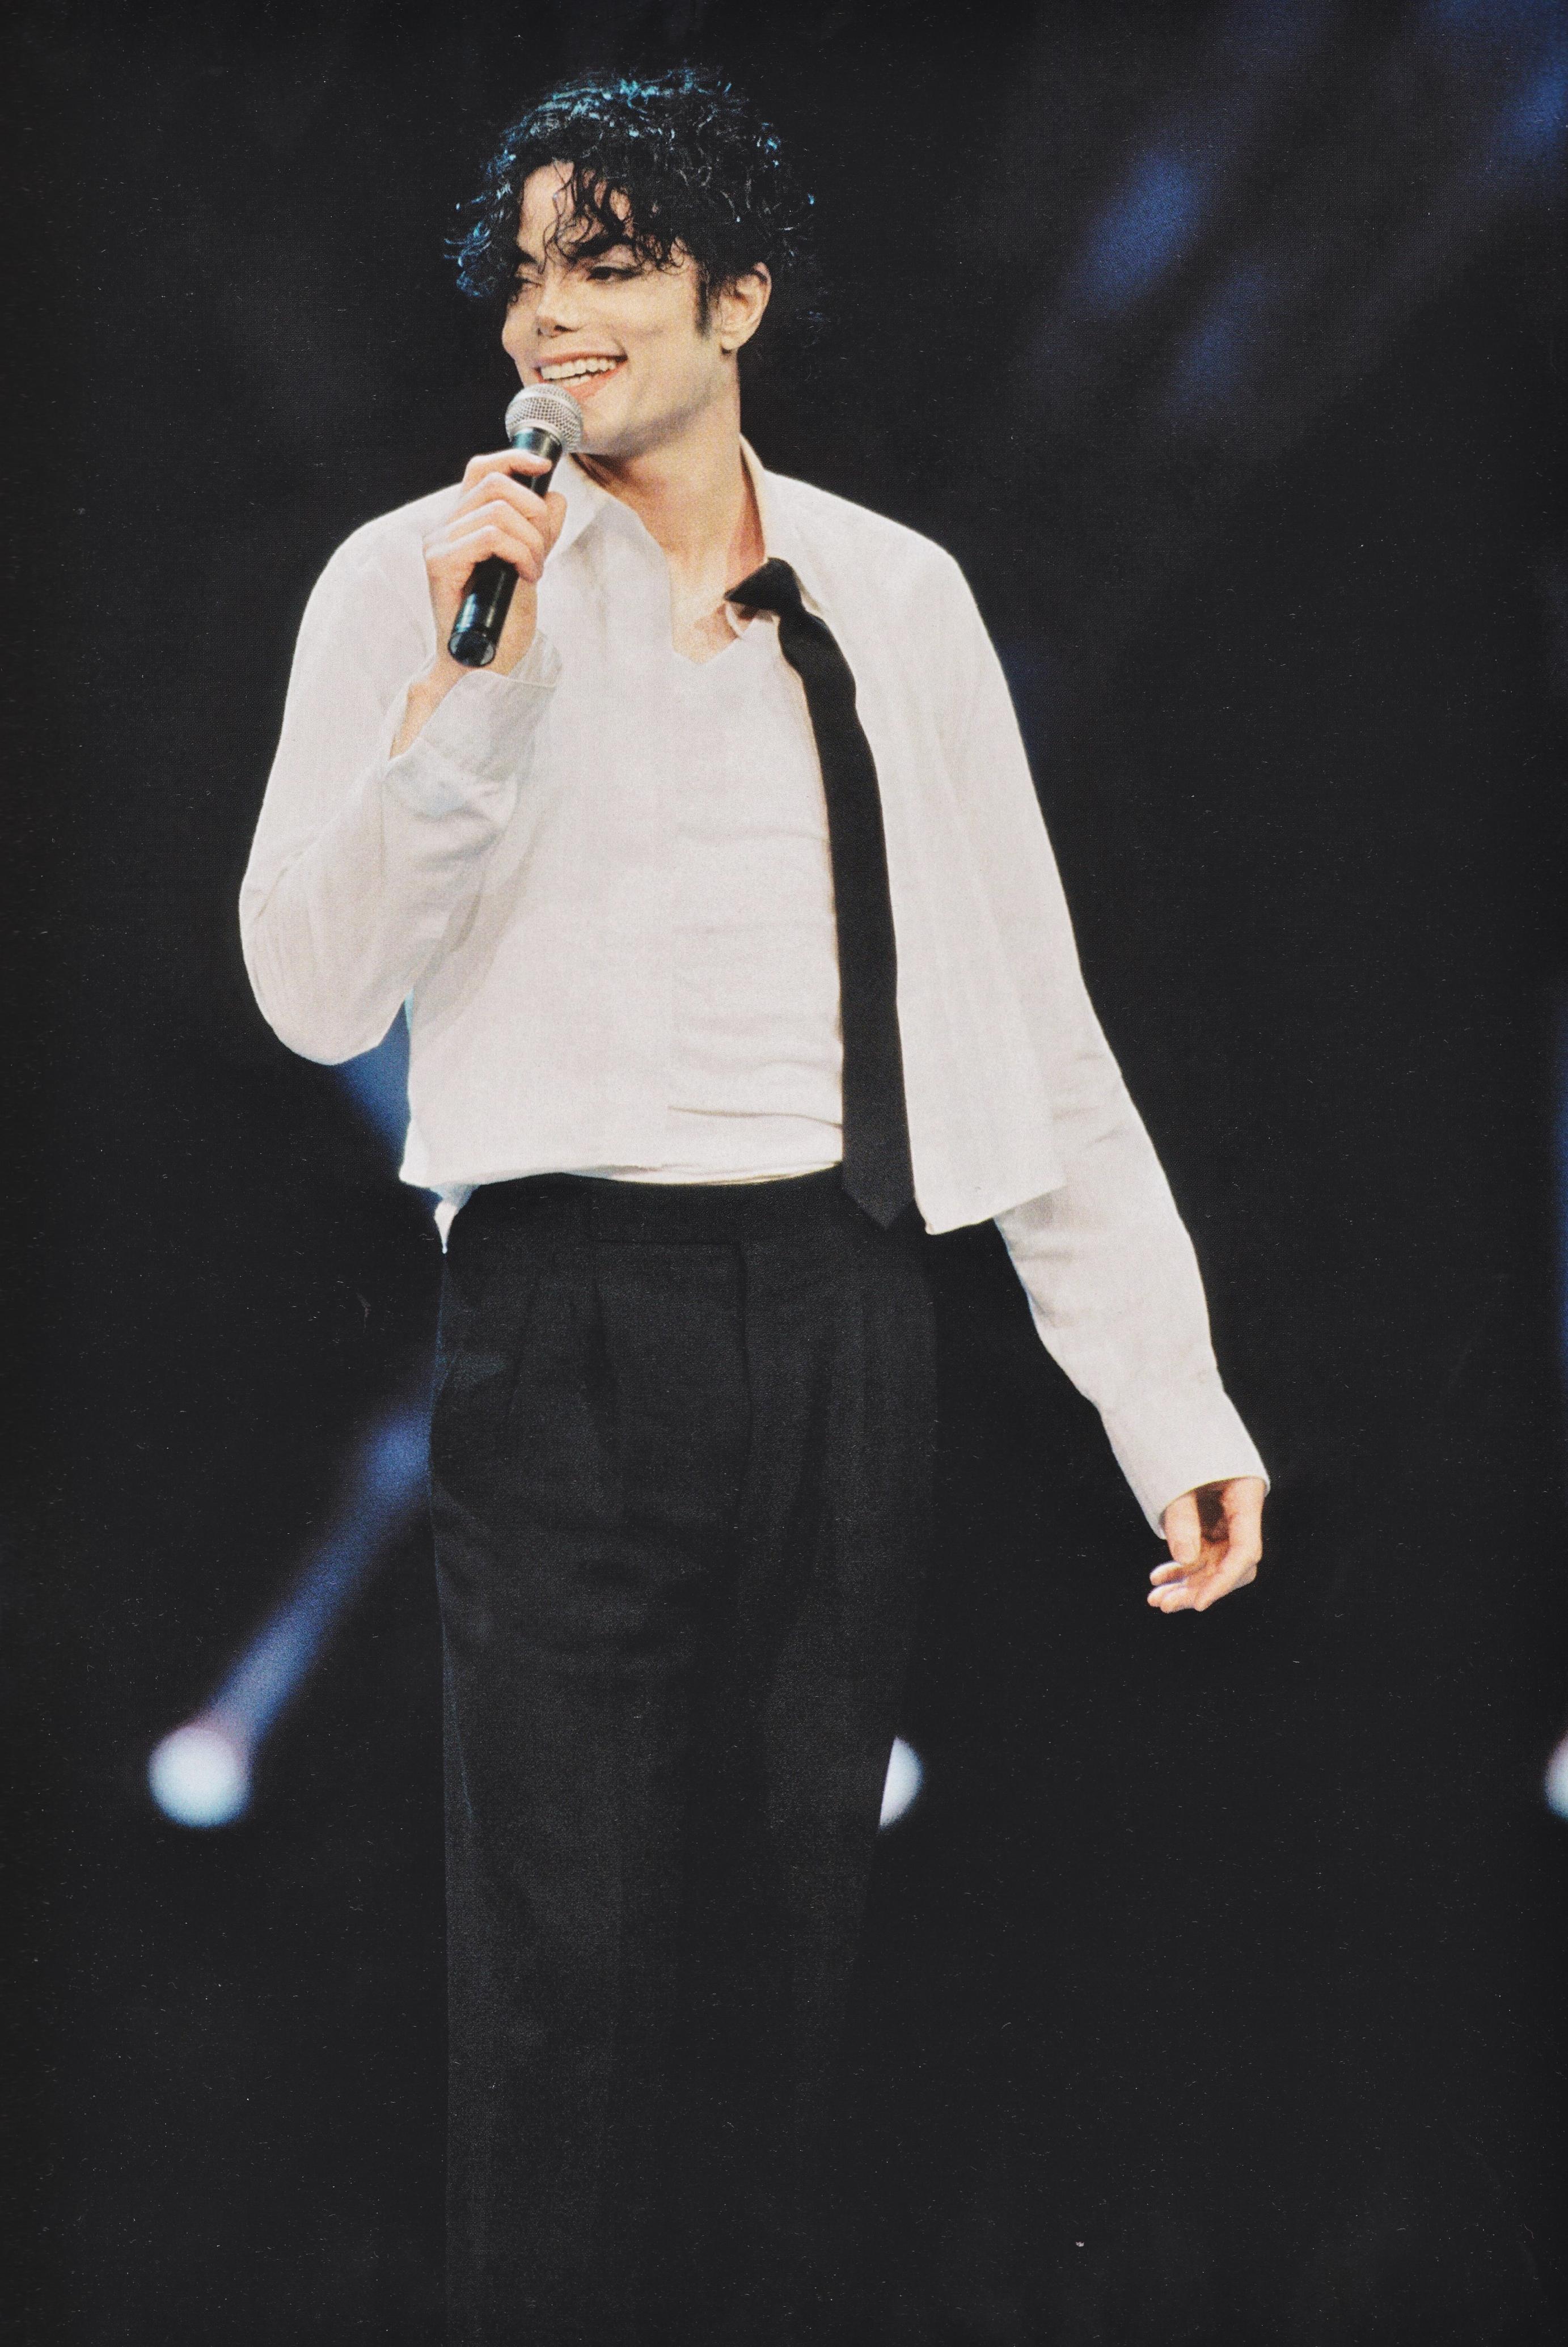 Michael Jackson - HQ Scan - The 12th Annual MTV Video Muzik Awards'95